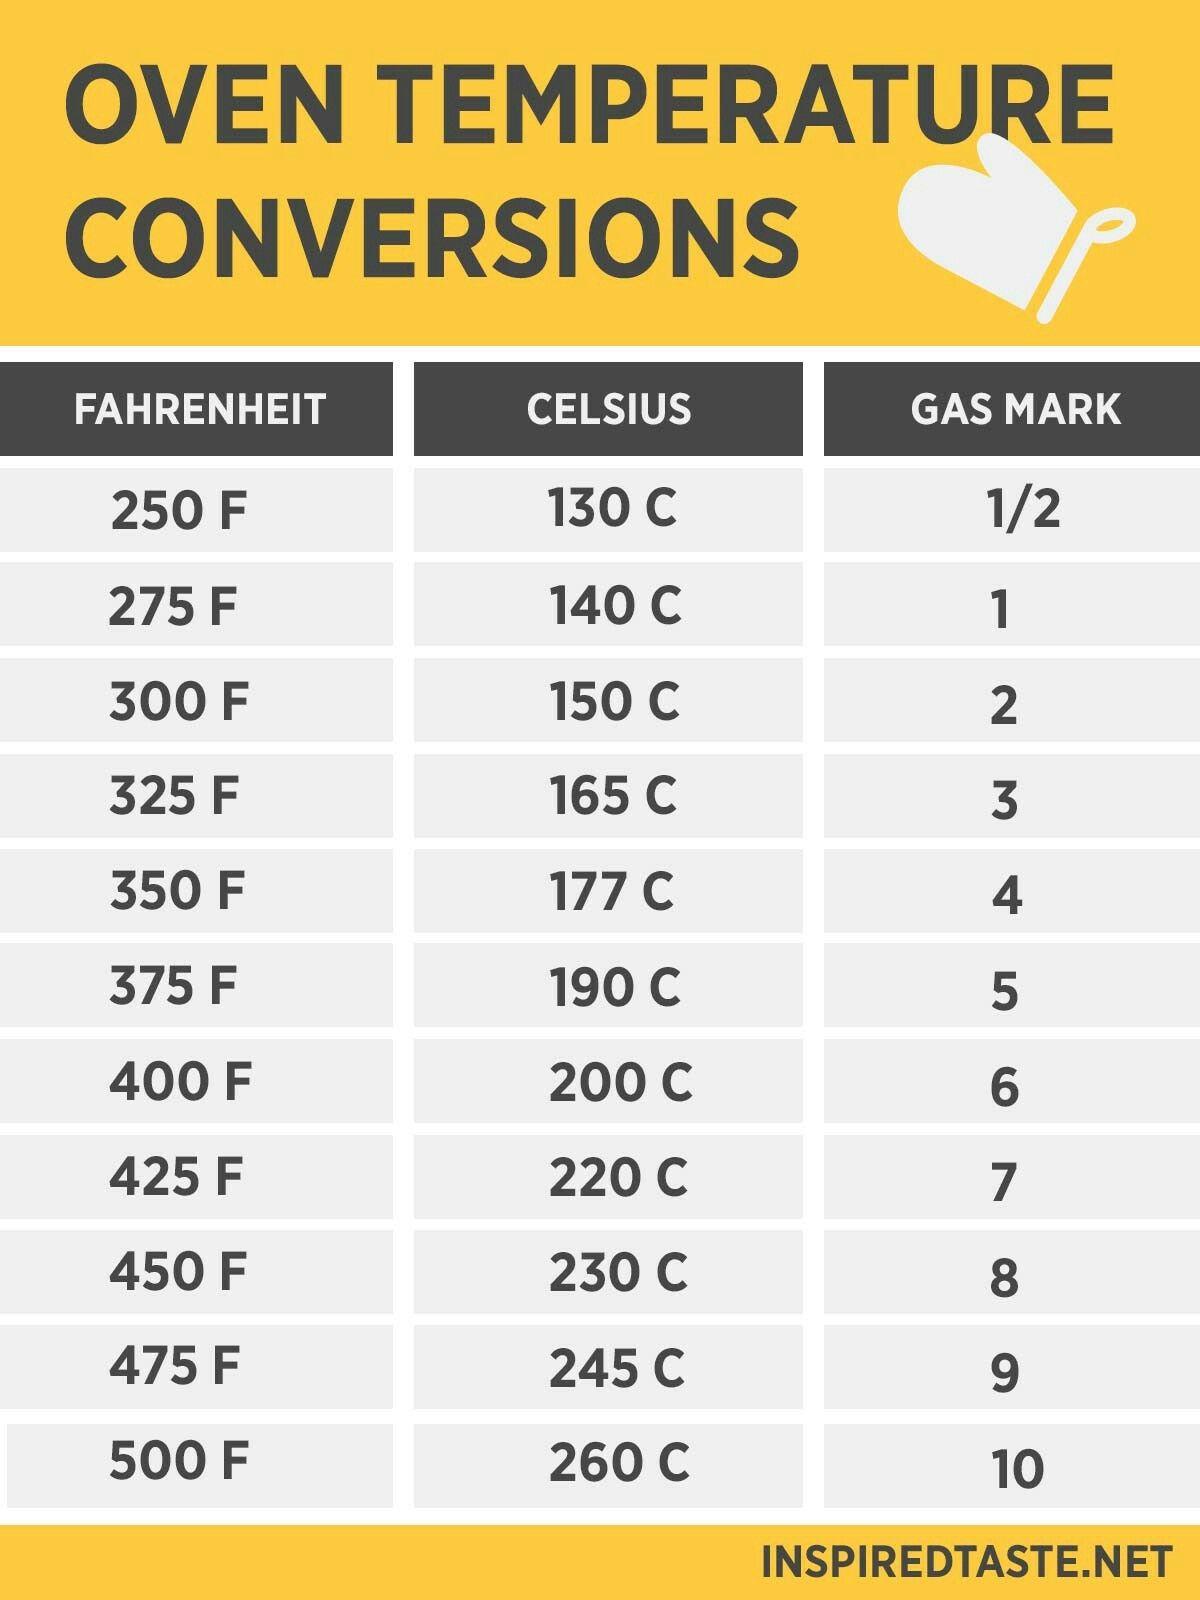 Oven temperature conversion chart fahrenheit to celsius to gas oven temperature conversion chart fahrenheit to celsius to gas mark nvjuhfo Image collections